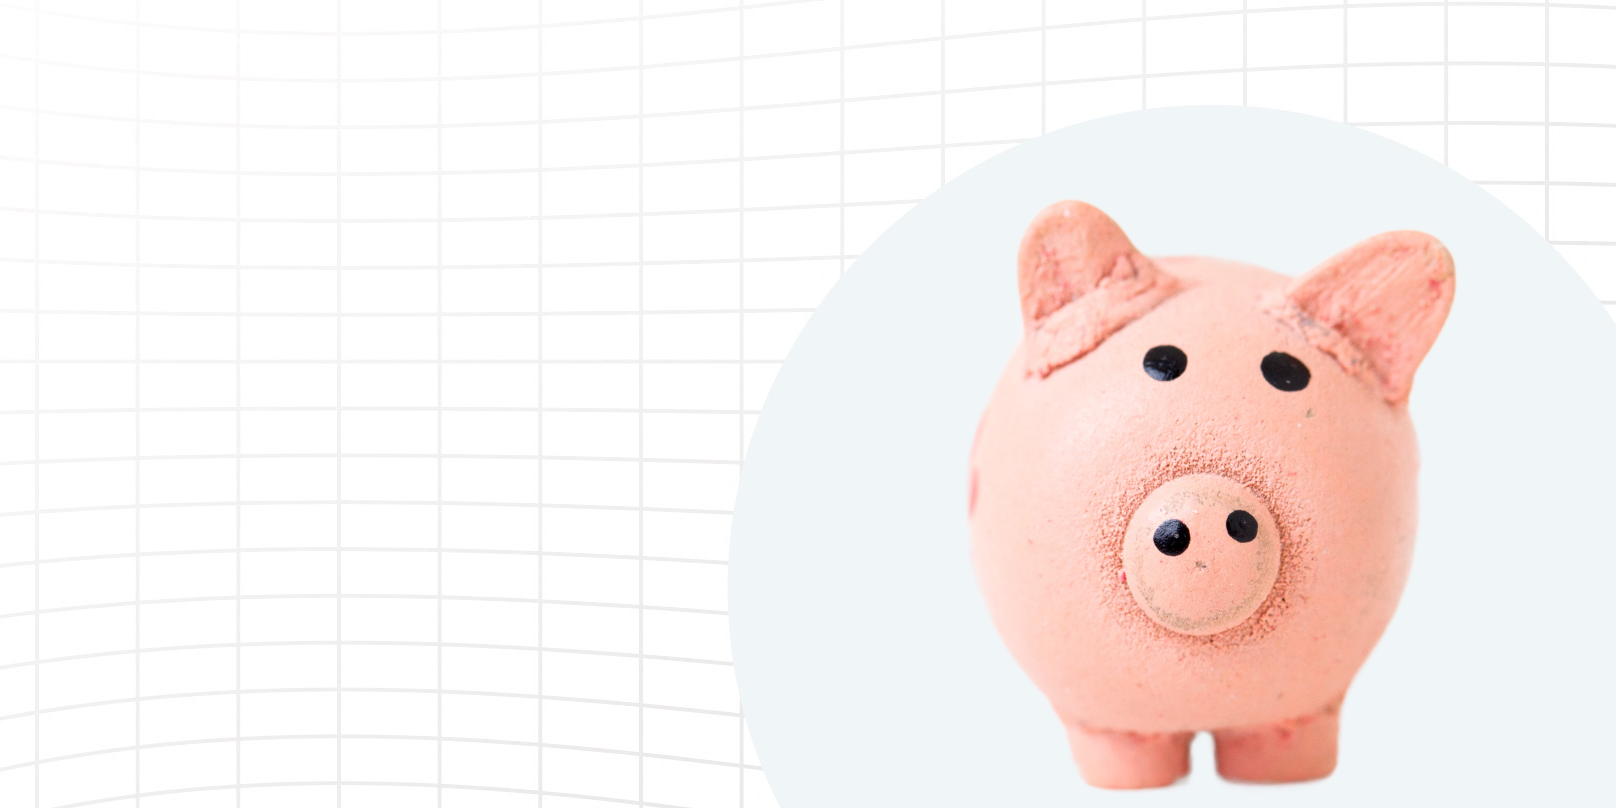 The Benefits (and Drawbacks) of Zero-Based Budgeting